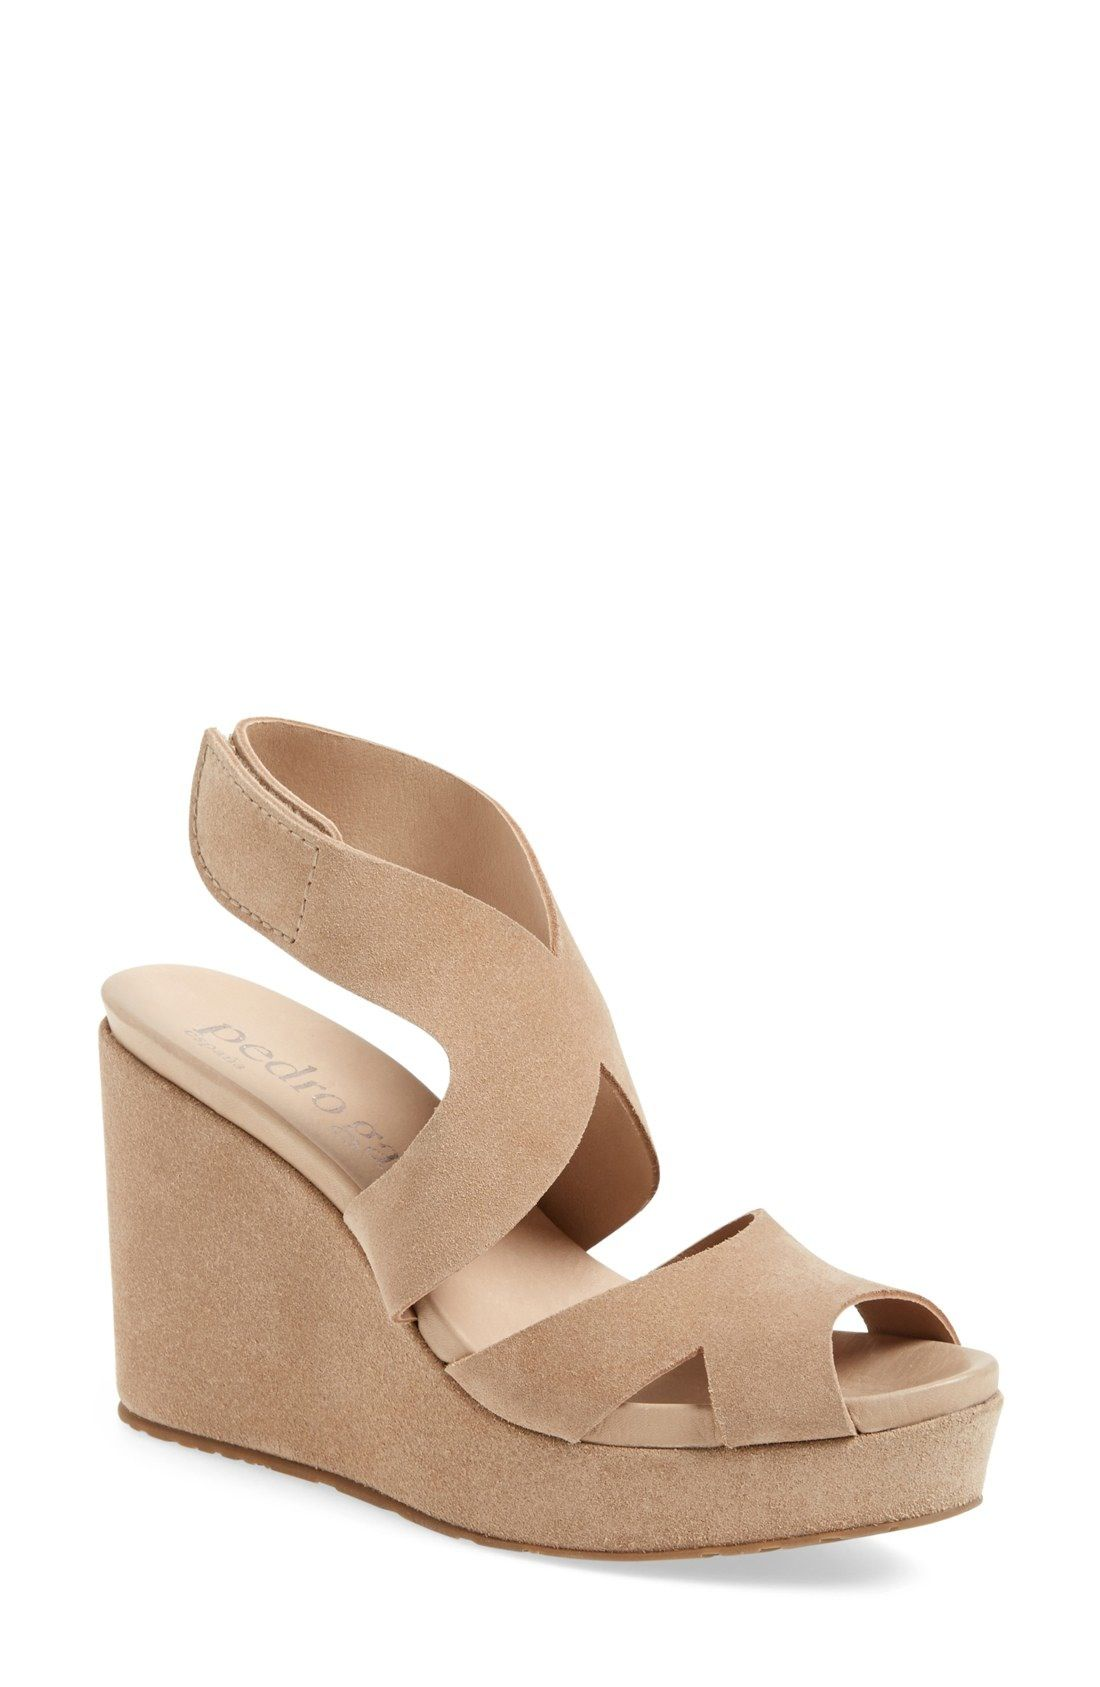 2015 new cheap online Pedro Garcia Laser-Cut Slingback Sandals fake sale online wZPF9nrDQ7